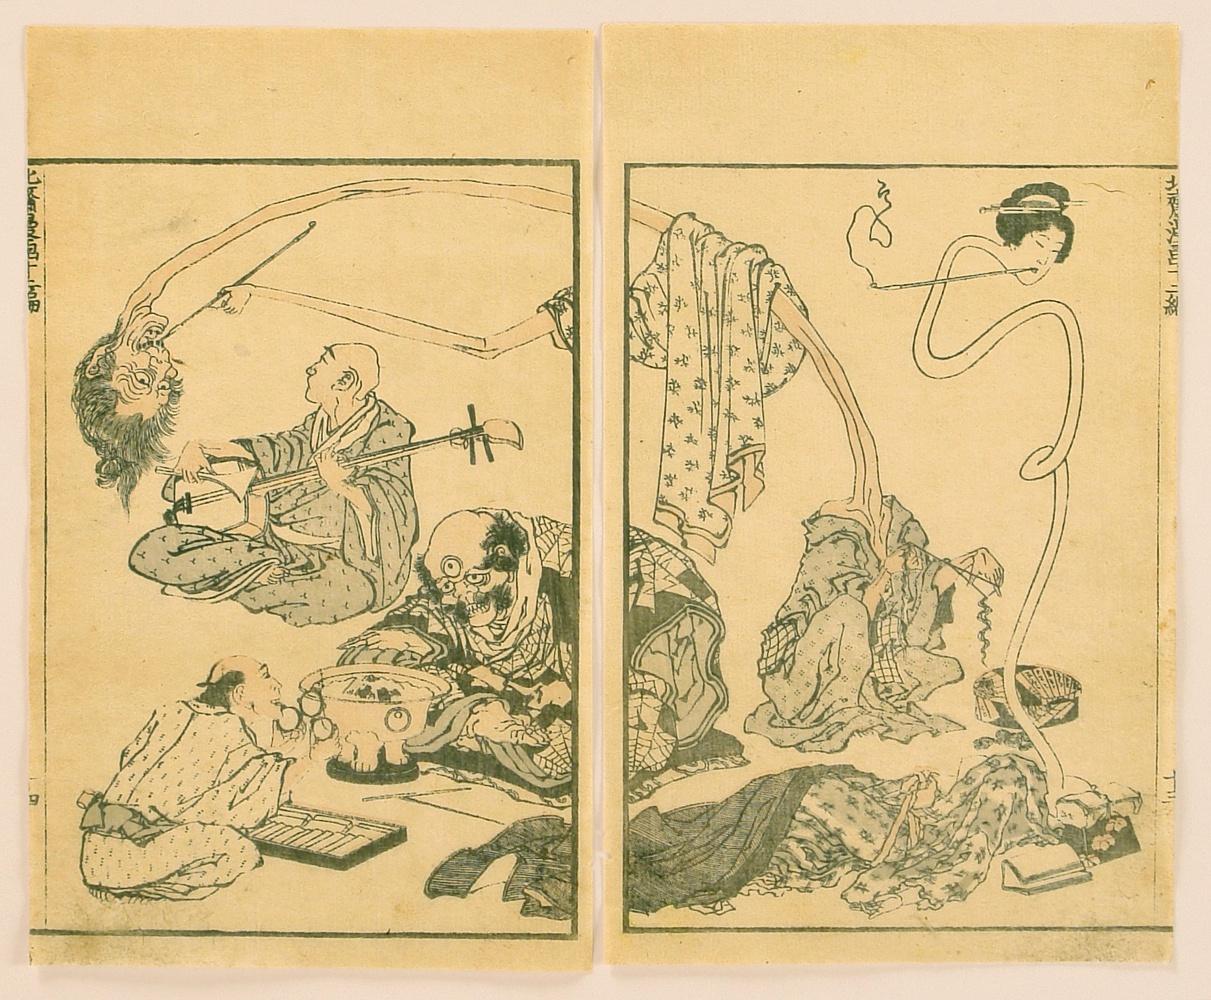 Katsushika Hokusai: Hokusai Manga Vol. 12 - Monsters ...: http://ukiyo-e.org/image/artelino/51677g1